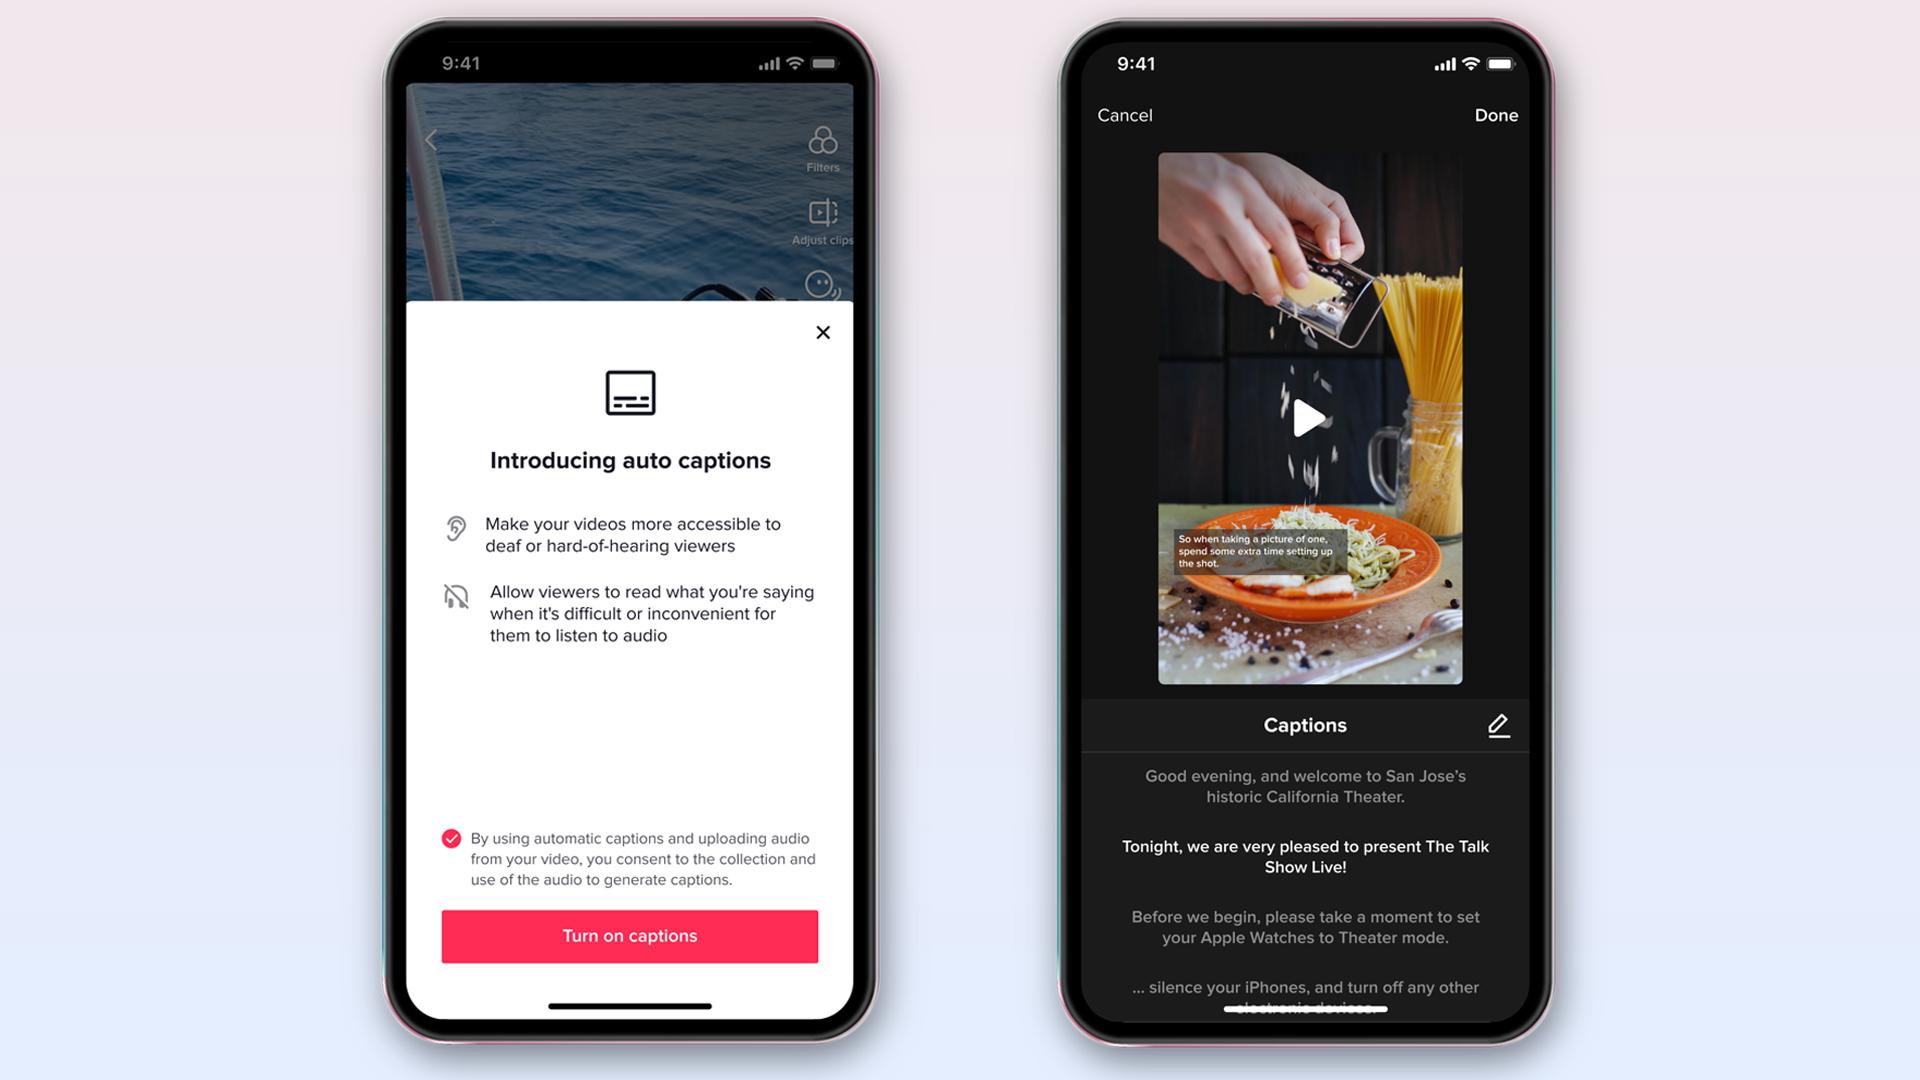 TikTok is finally adding automatic captions | Engadget